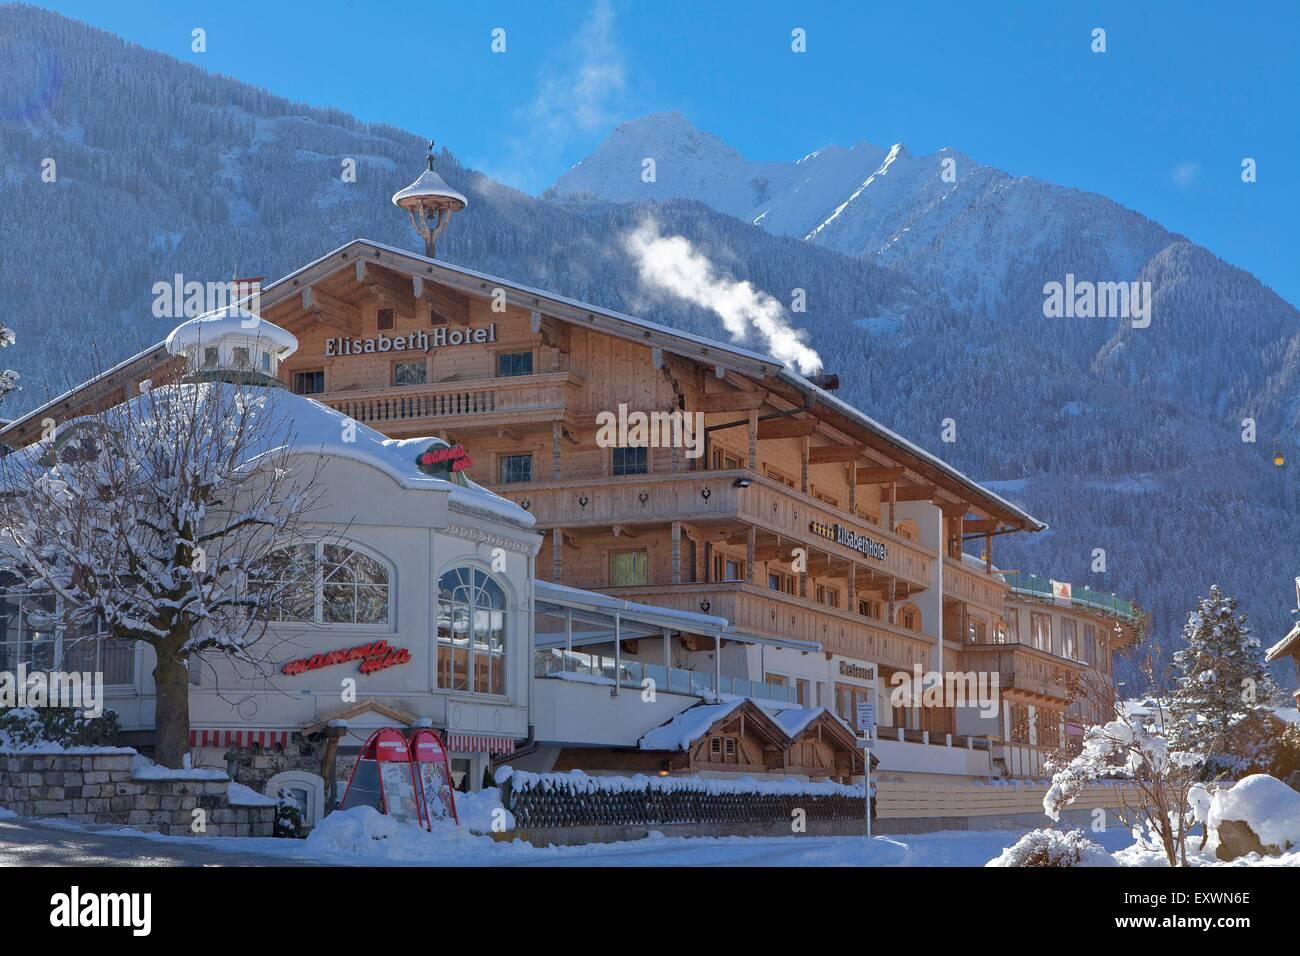 Hotel in winter in Mayrhofen, Tyrol, Austria - Stock Image